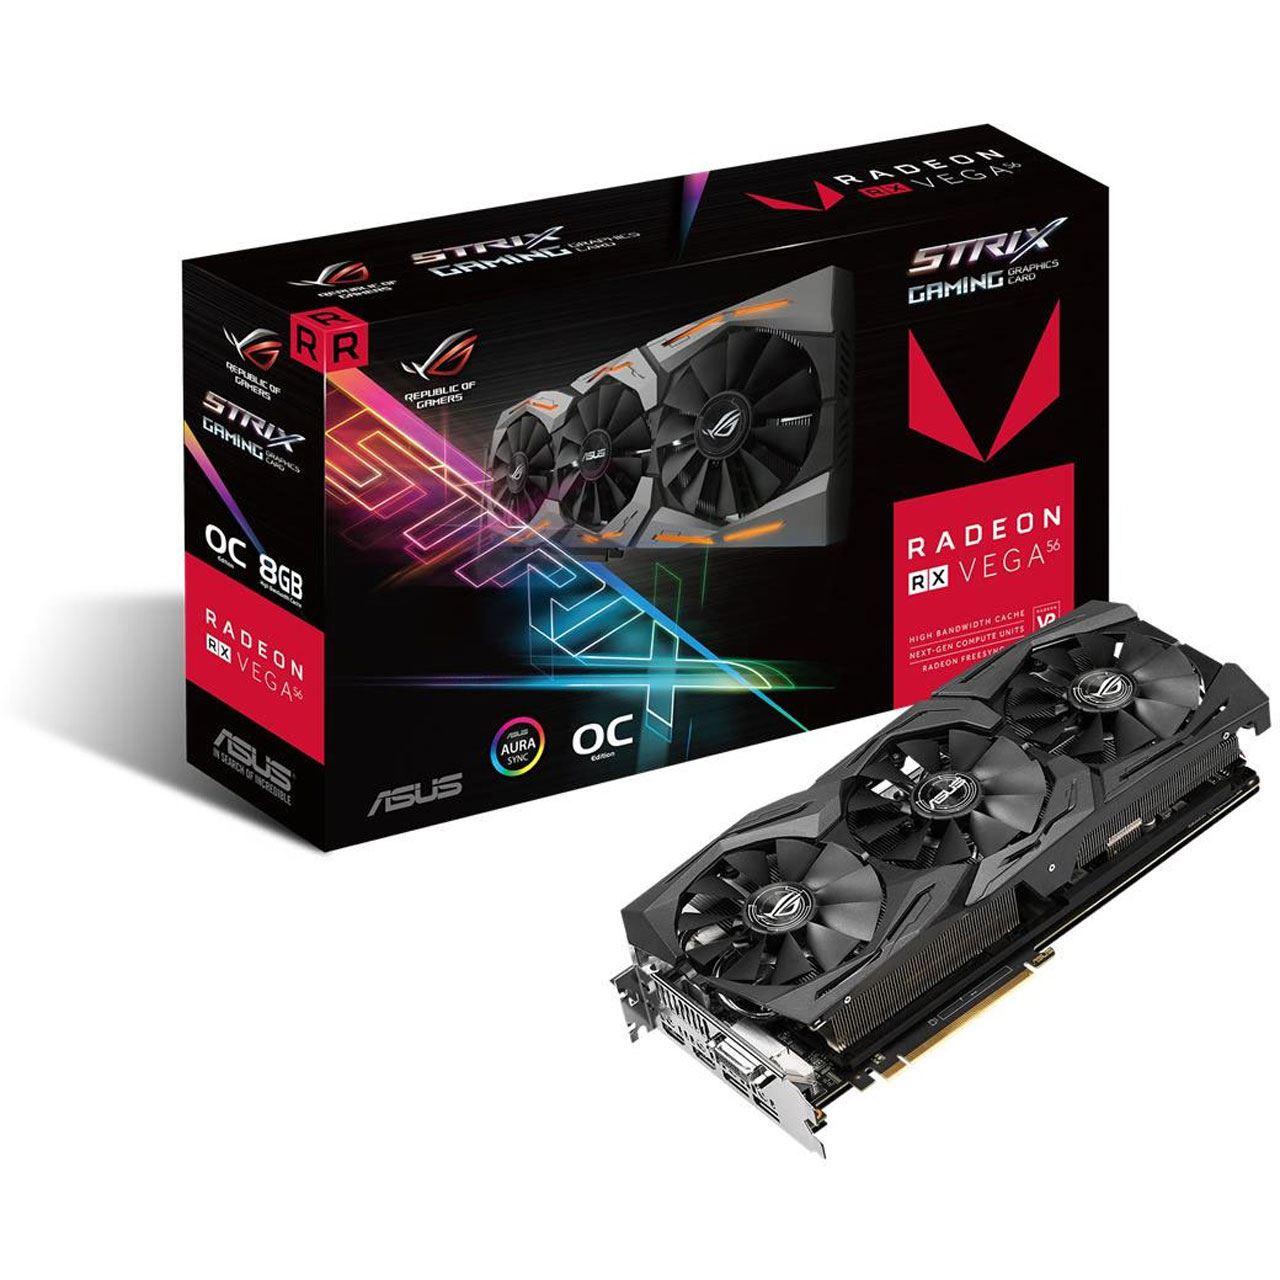 [Mindfactory+Logoix] 8GB Asus Radeon RX Vega 56 ROG Strix OC Aktiv PCIe 3.0 x16 + 3 Games